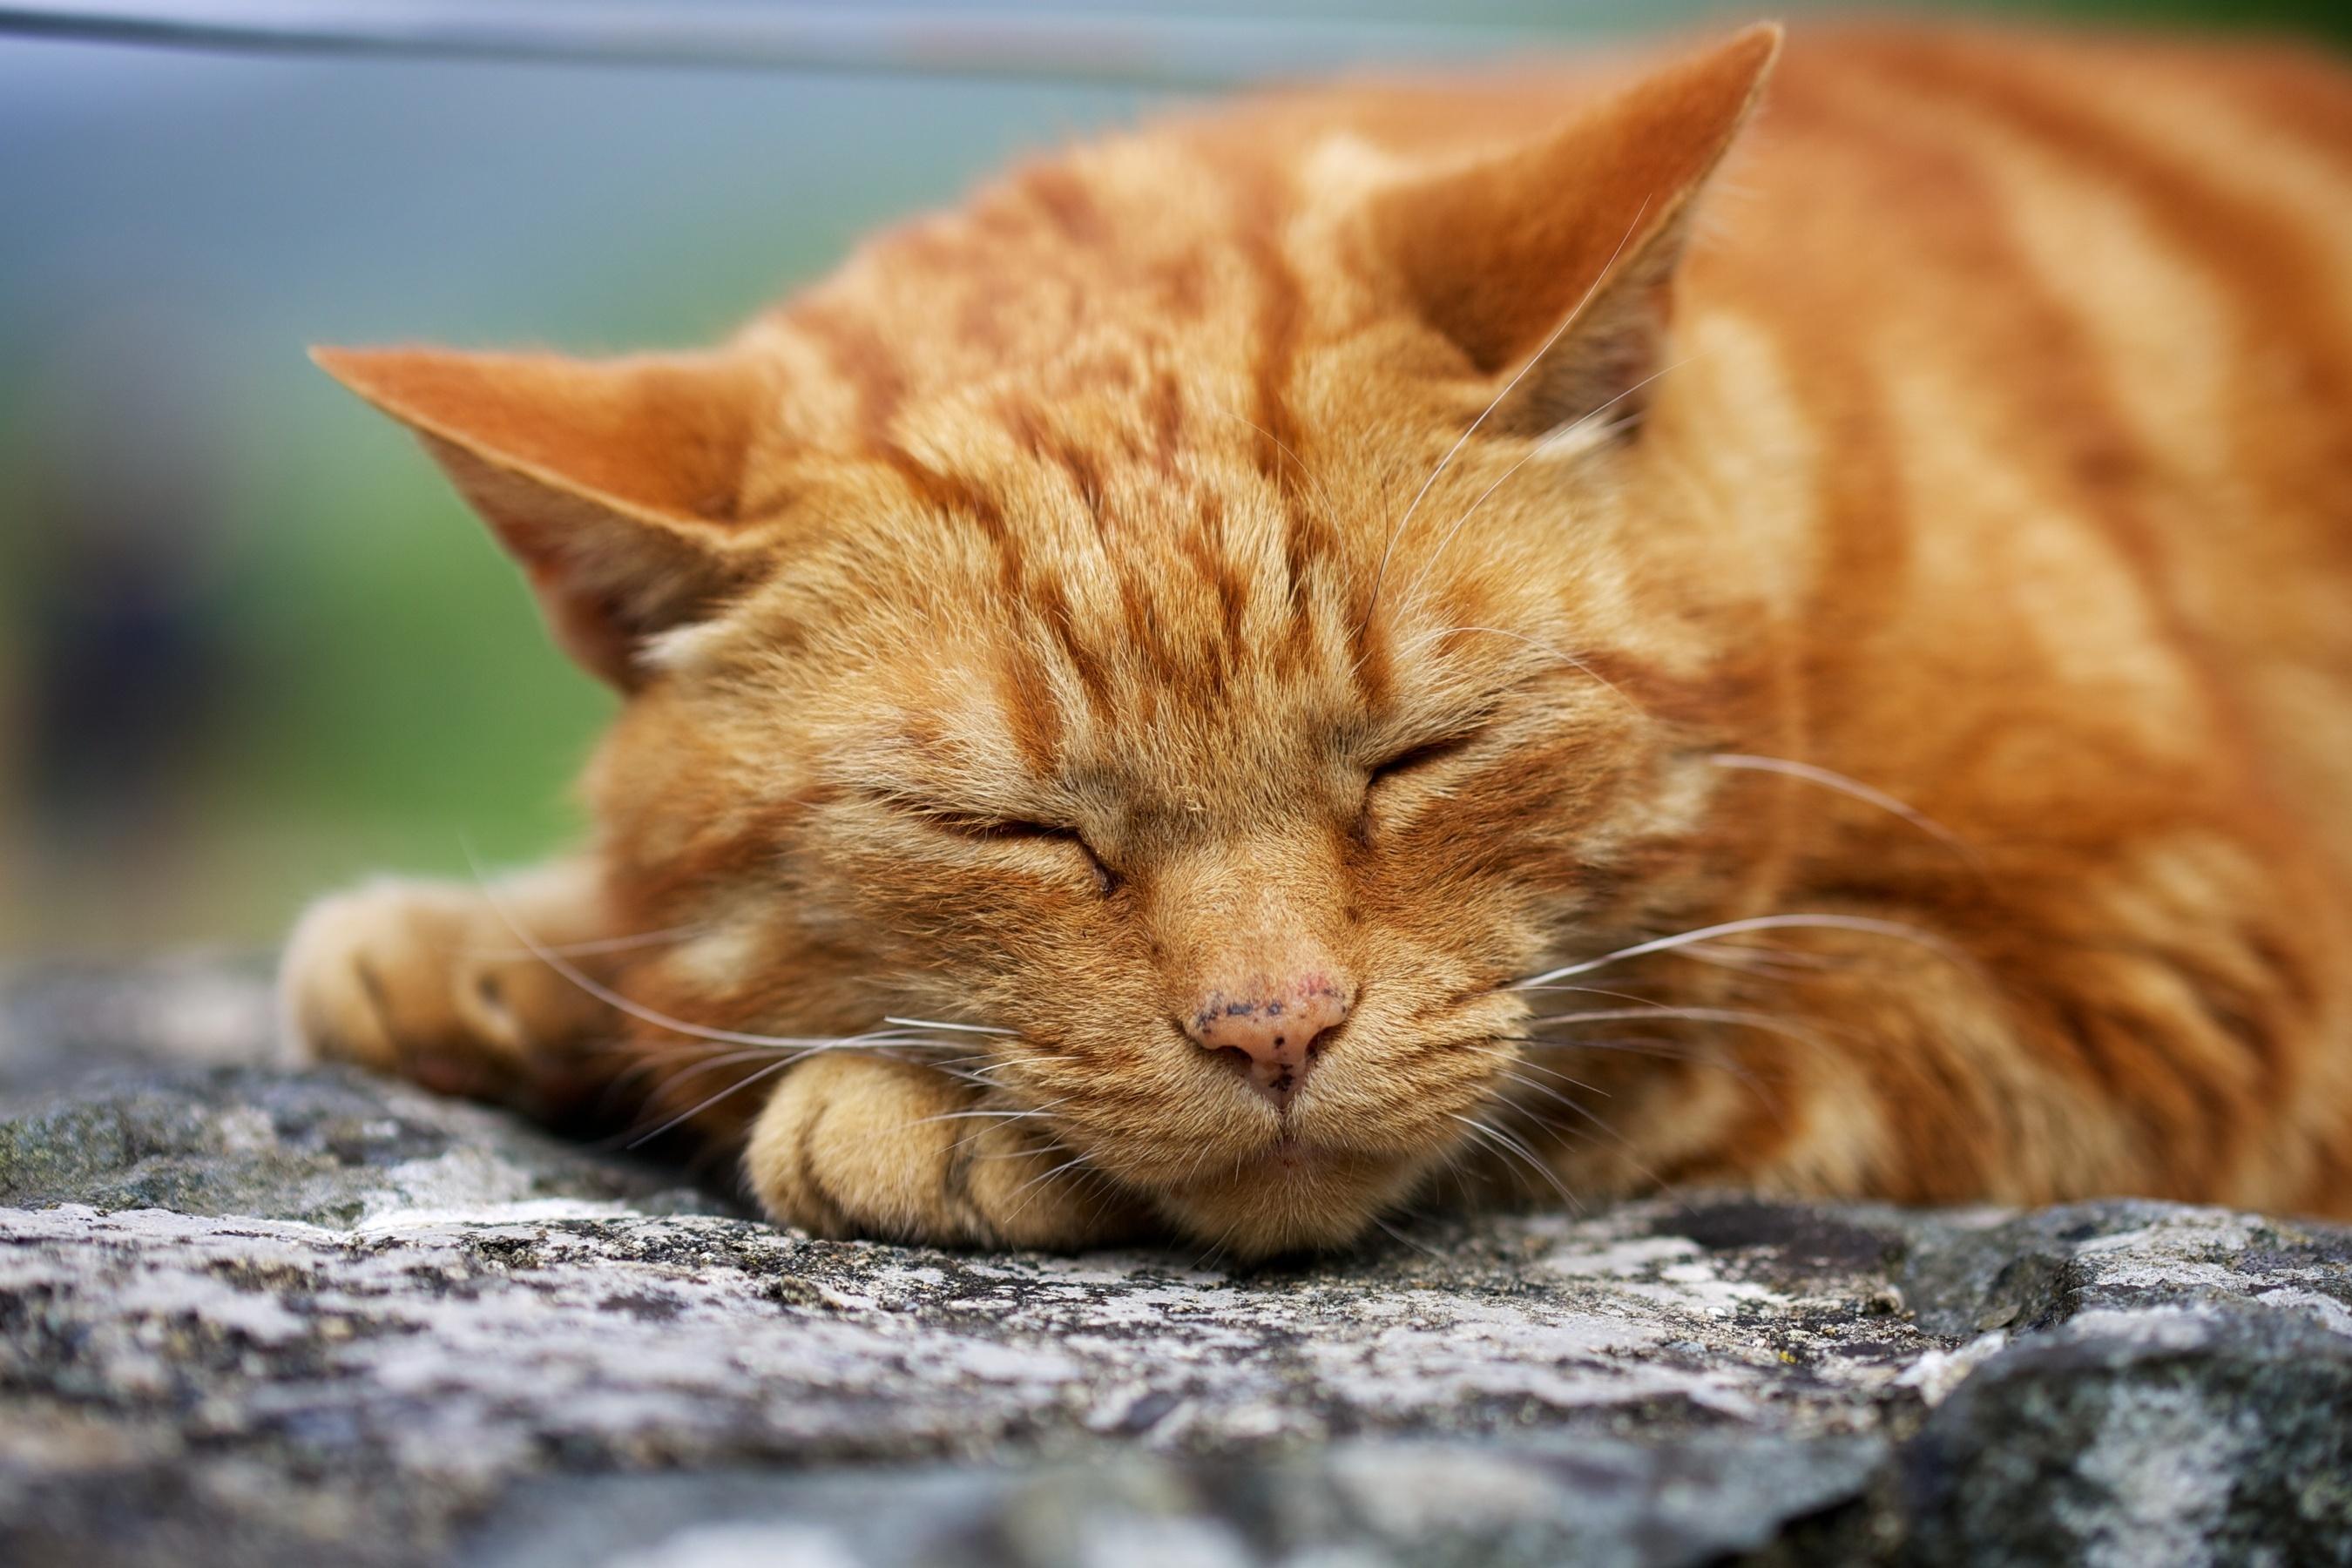 kitty cute sleeping wallpaper